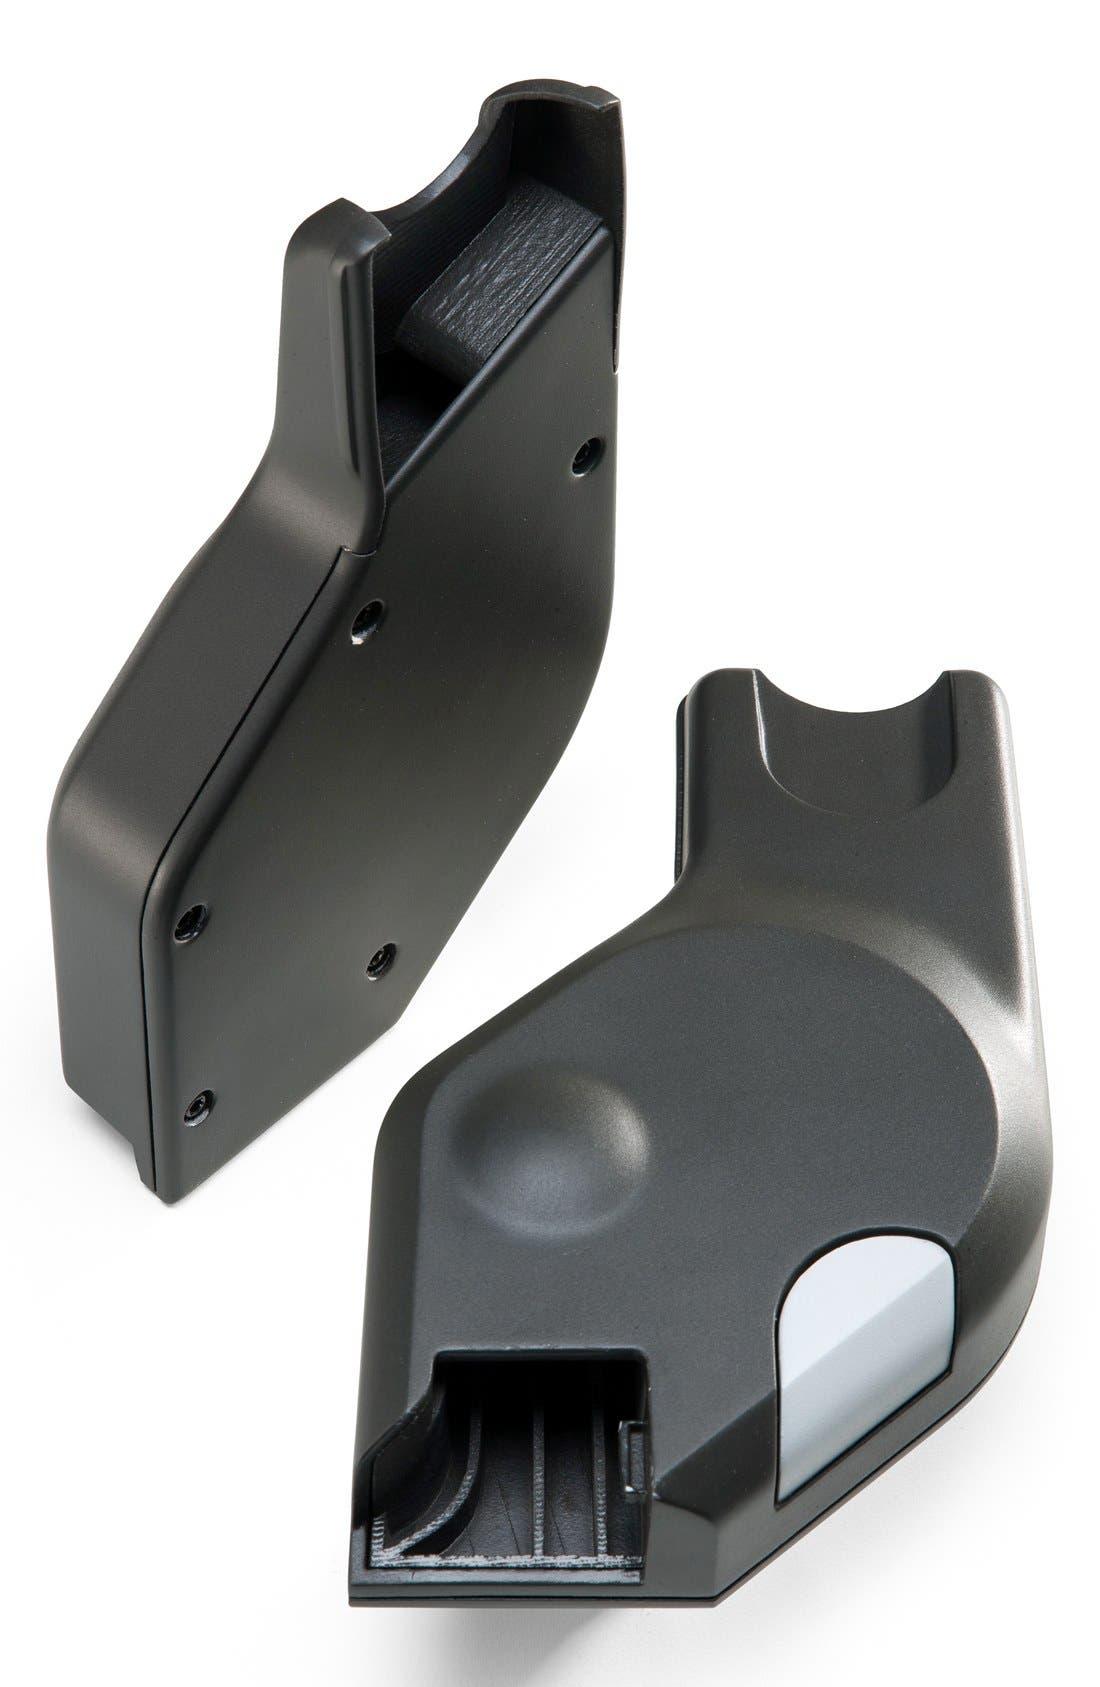 Toddler Stokke Xplory  Stokke Scoot Car Seat Adaptor For Maxi Cosi  Nuna Size One Size  Grey